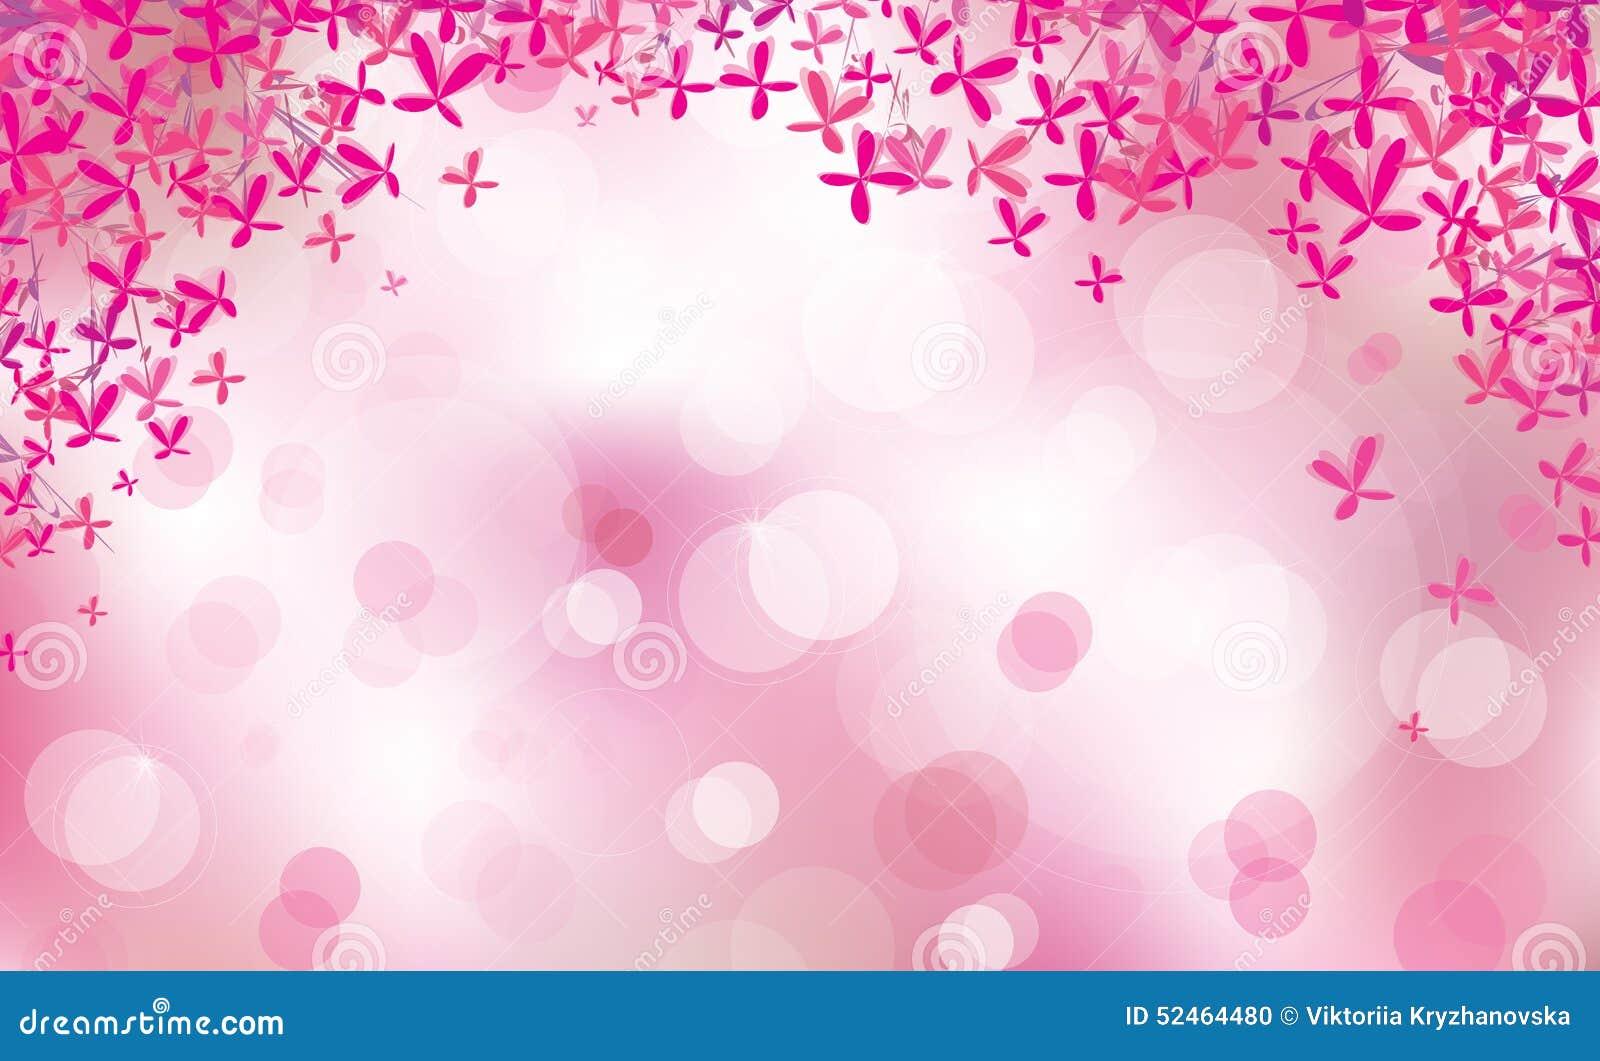 Pink floral shapes border on bokeh pink background for Valentine day ...